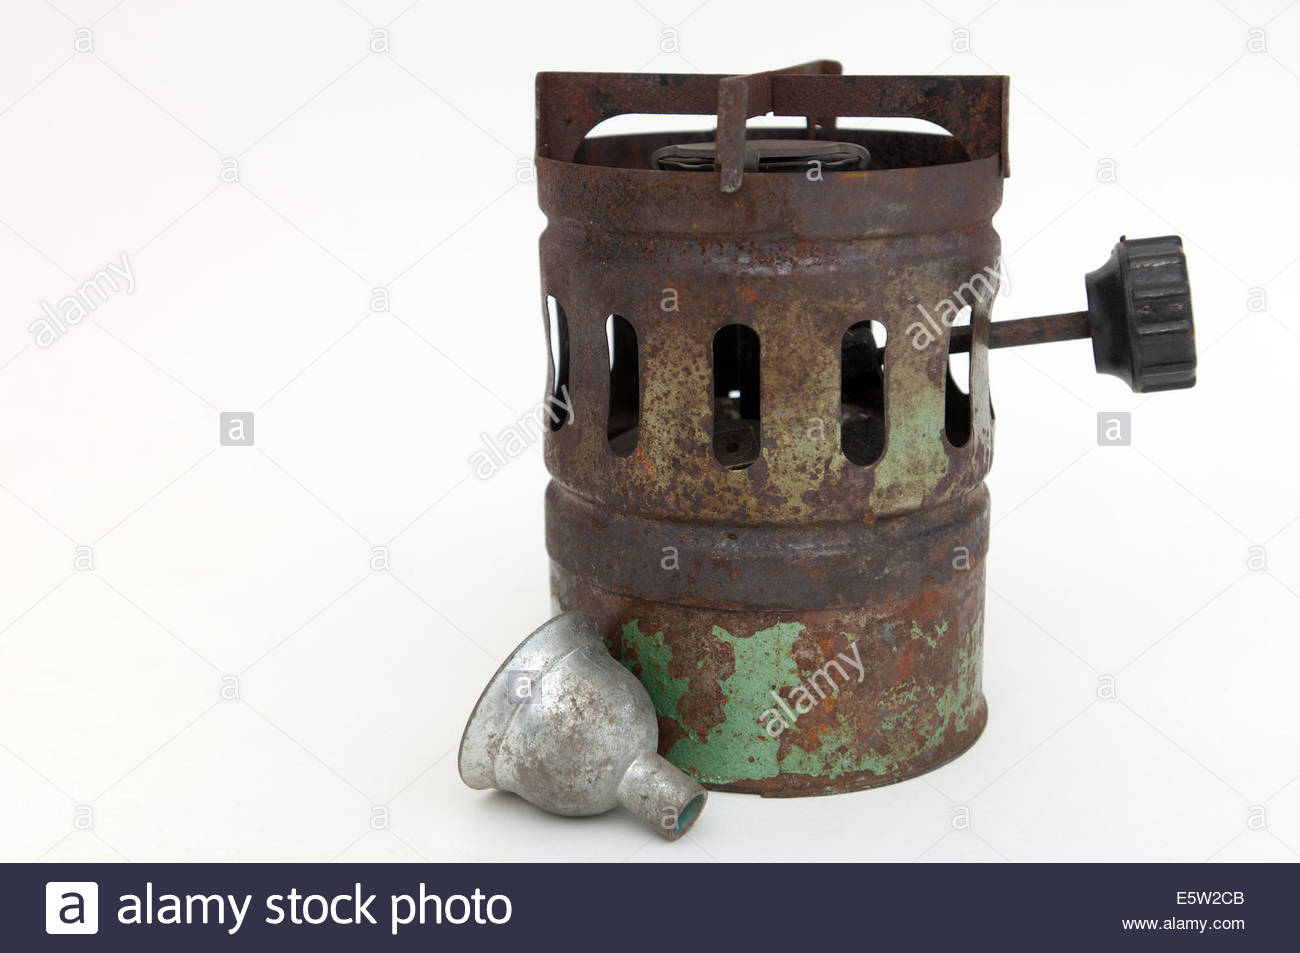 old stove on white background - Stock Image